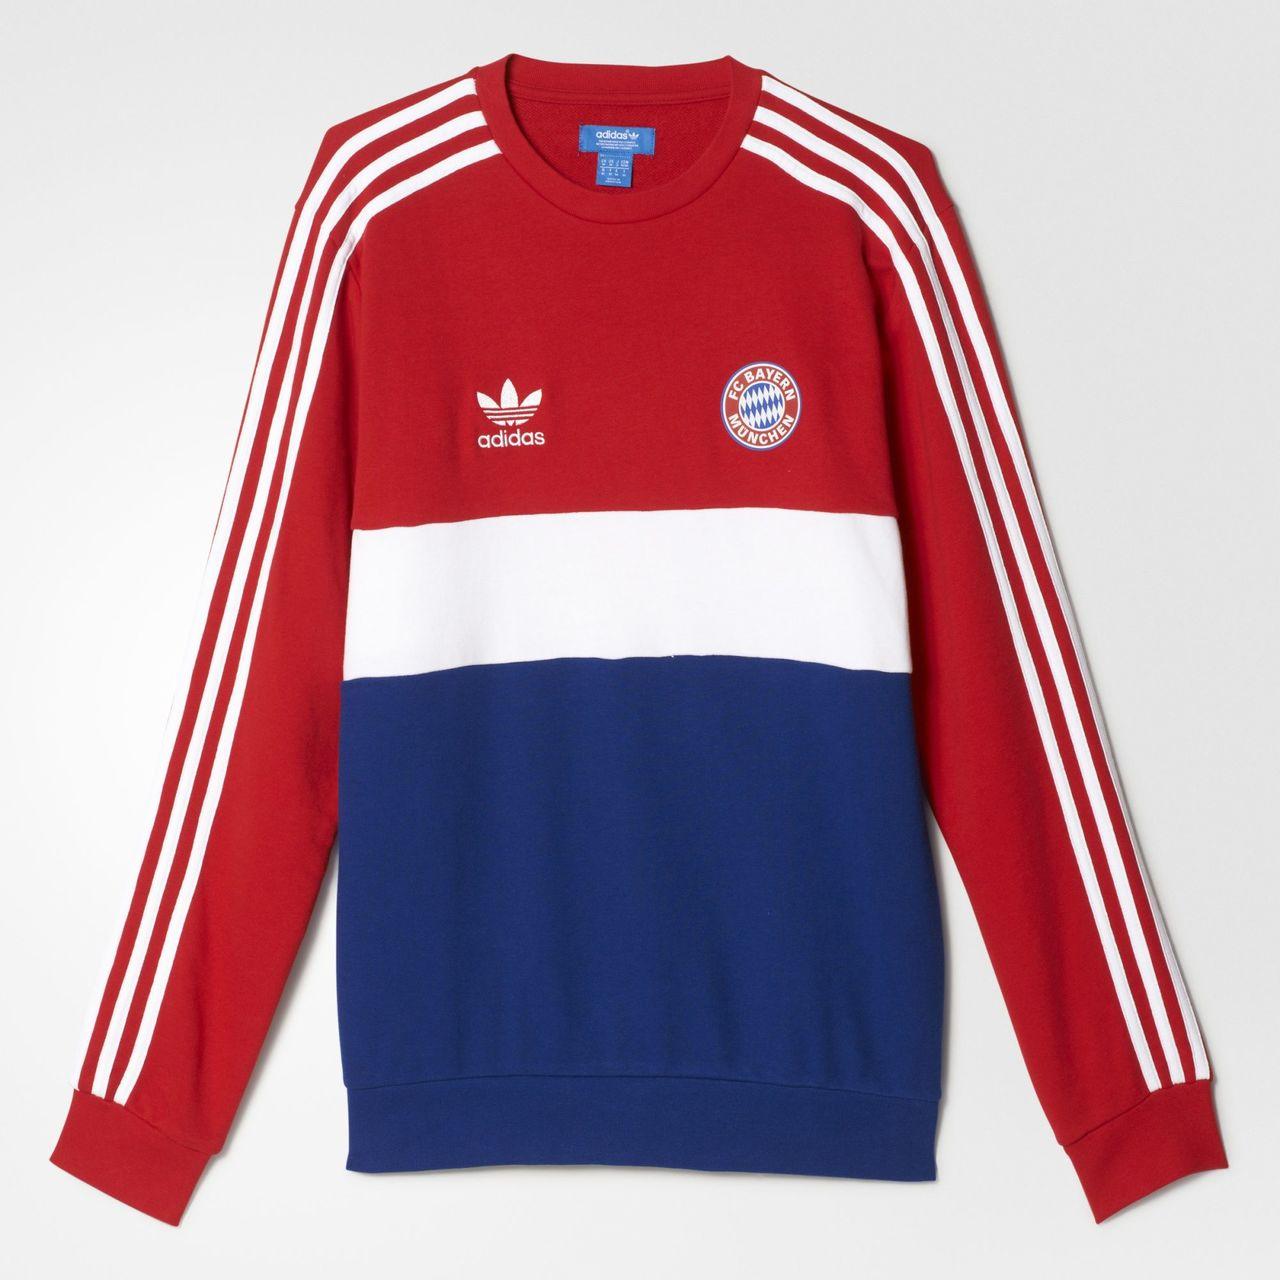 newest collection 1dbee 7b76f Adidas Originals Fc Bayern Retro Football Shirt | Azərbaycan ...